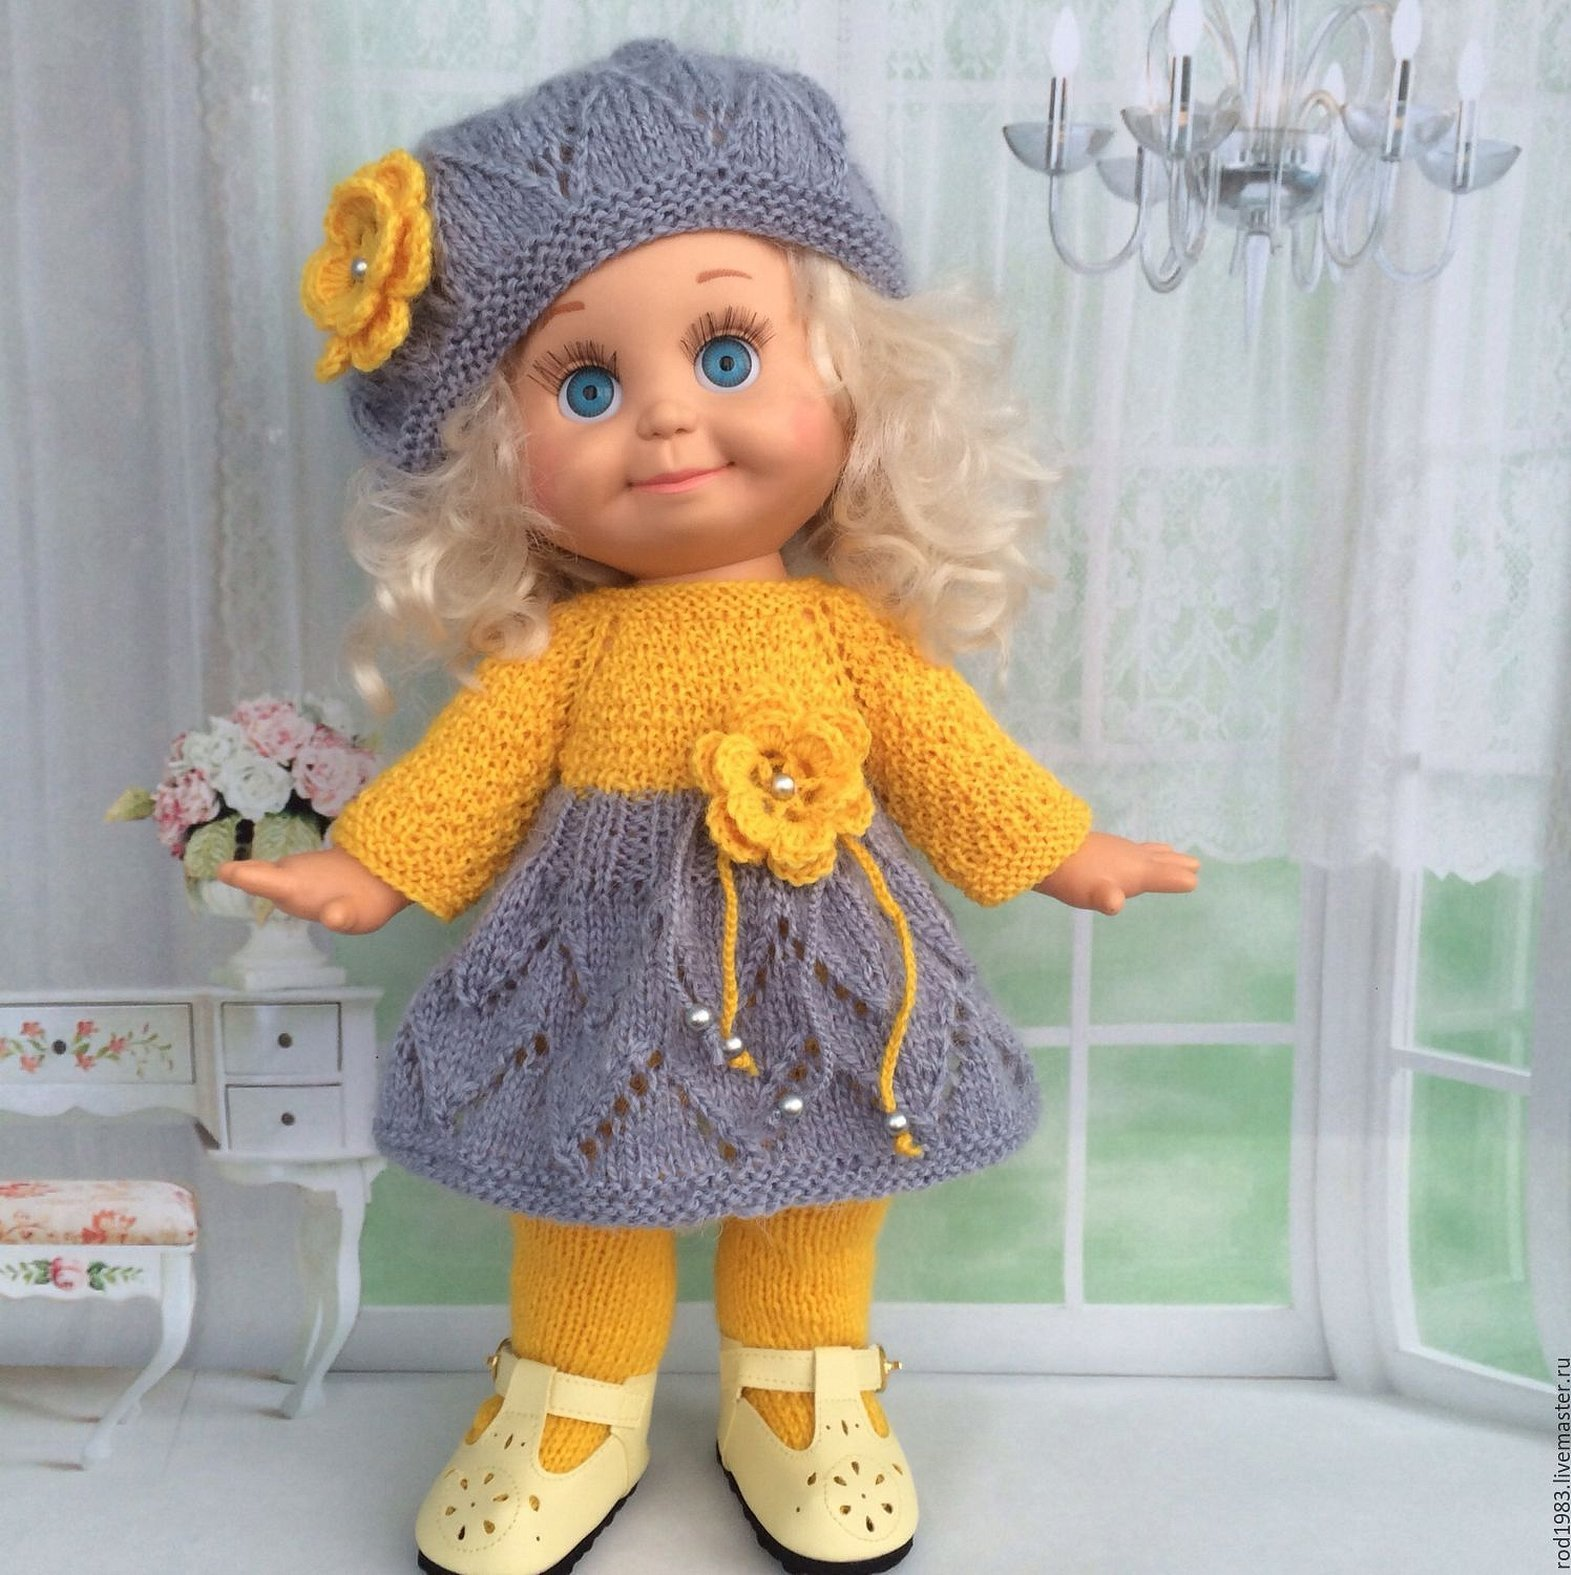 Вязаные наряды для кукол беби фейс крючком